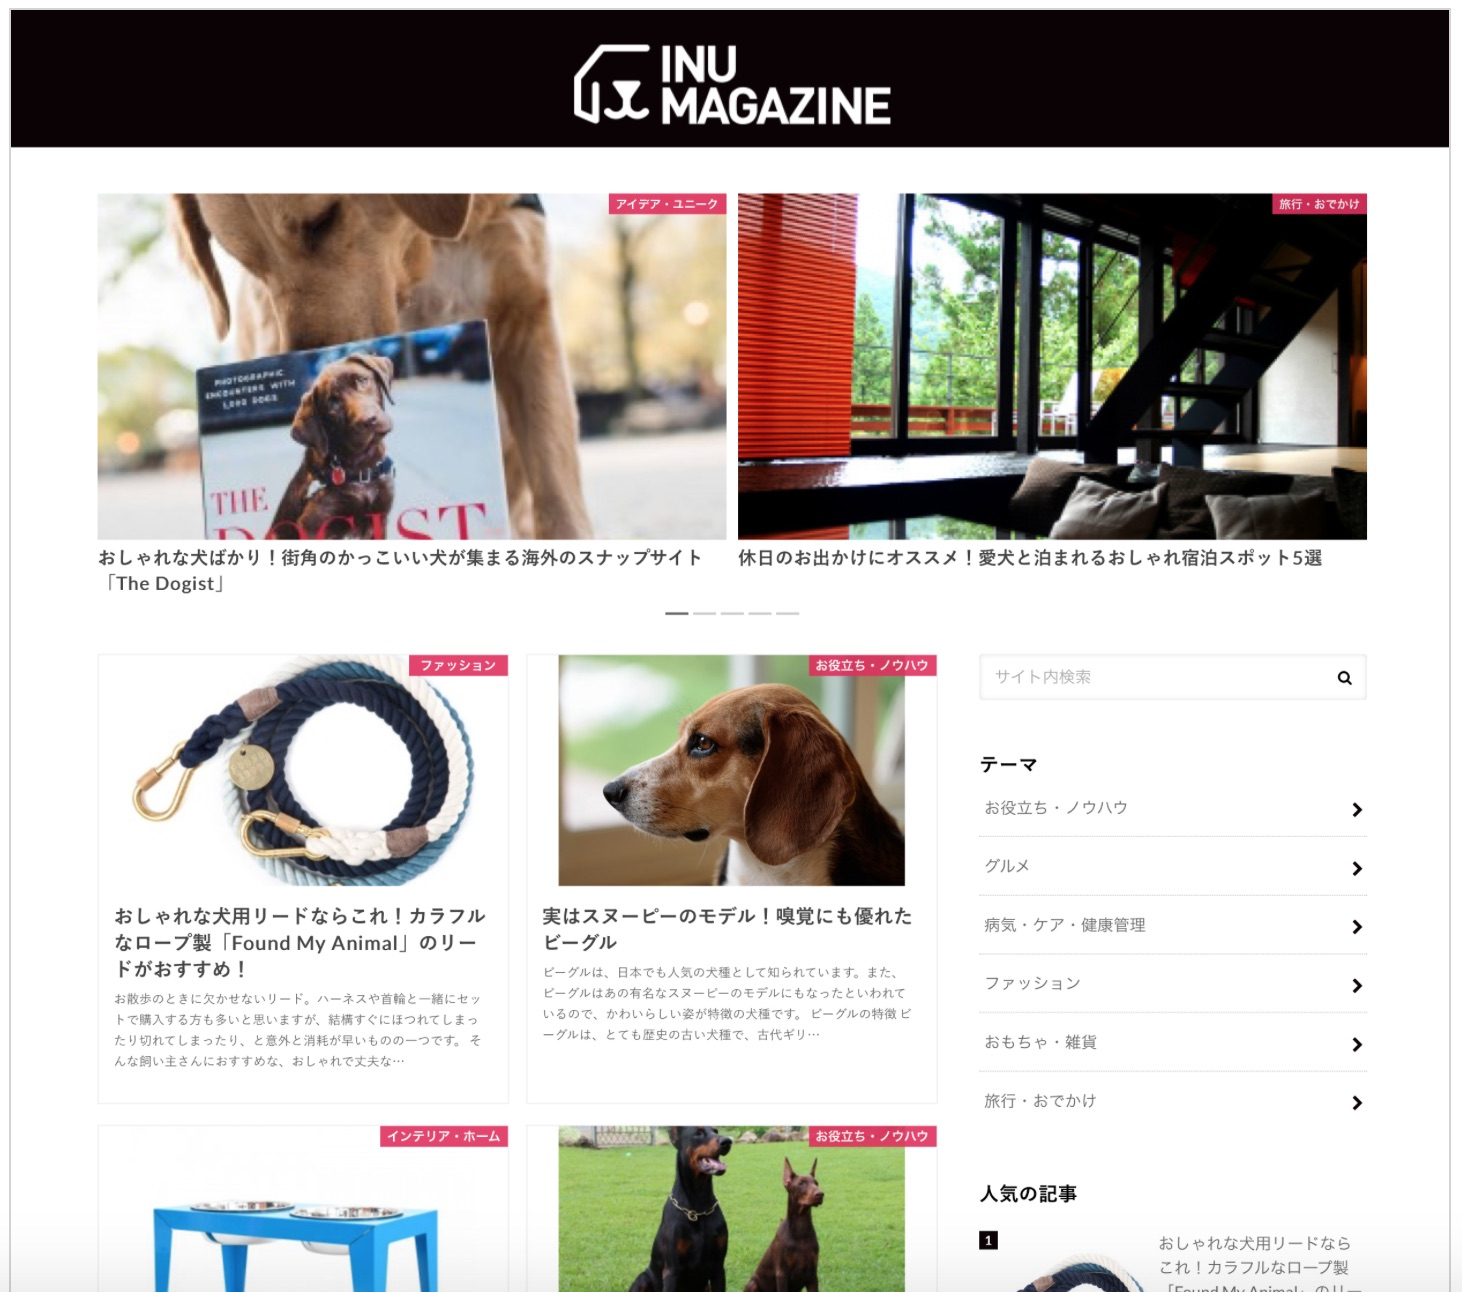 INUMAGAZINE-PC_スクリーンショット_20160110